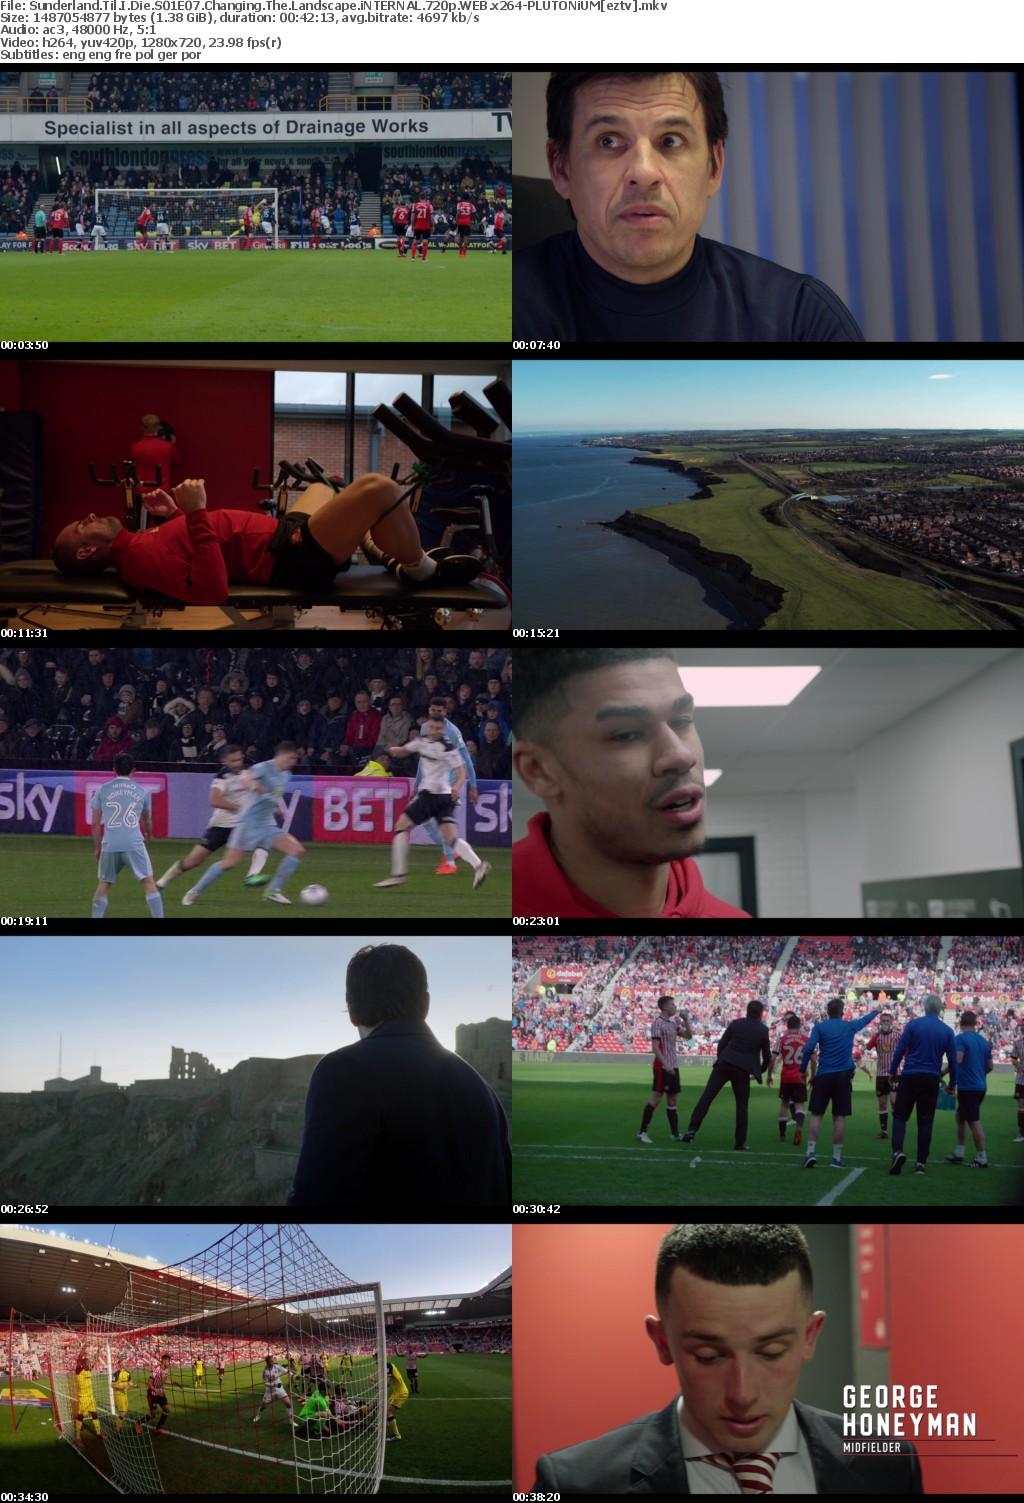 Sunderland Til I Die S01E07 Changing The Landscape iNTERNAL 720p WEB x264-PLUTONiUM